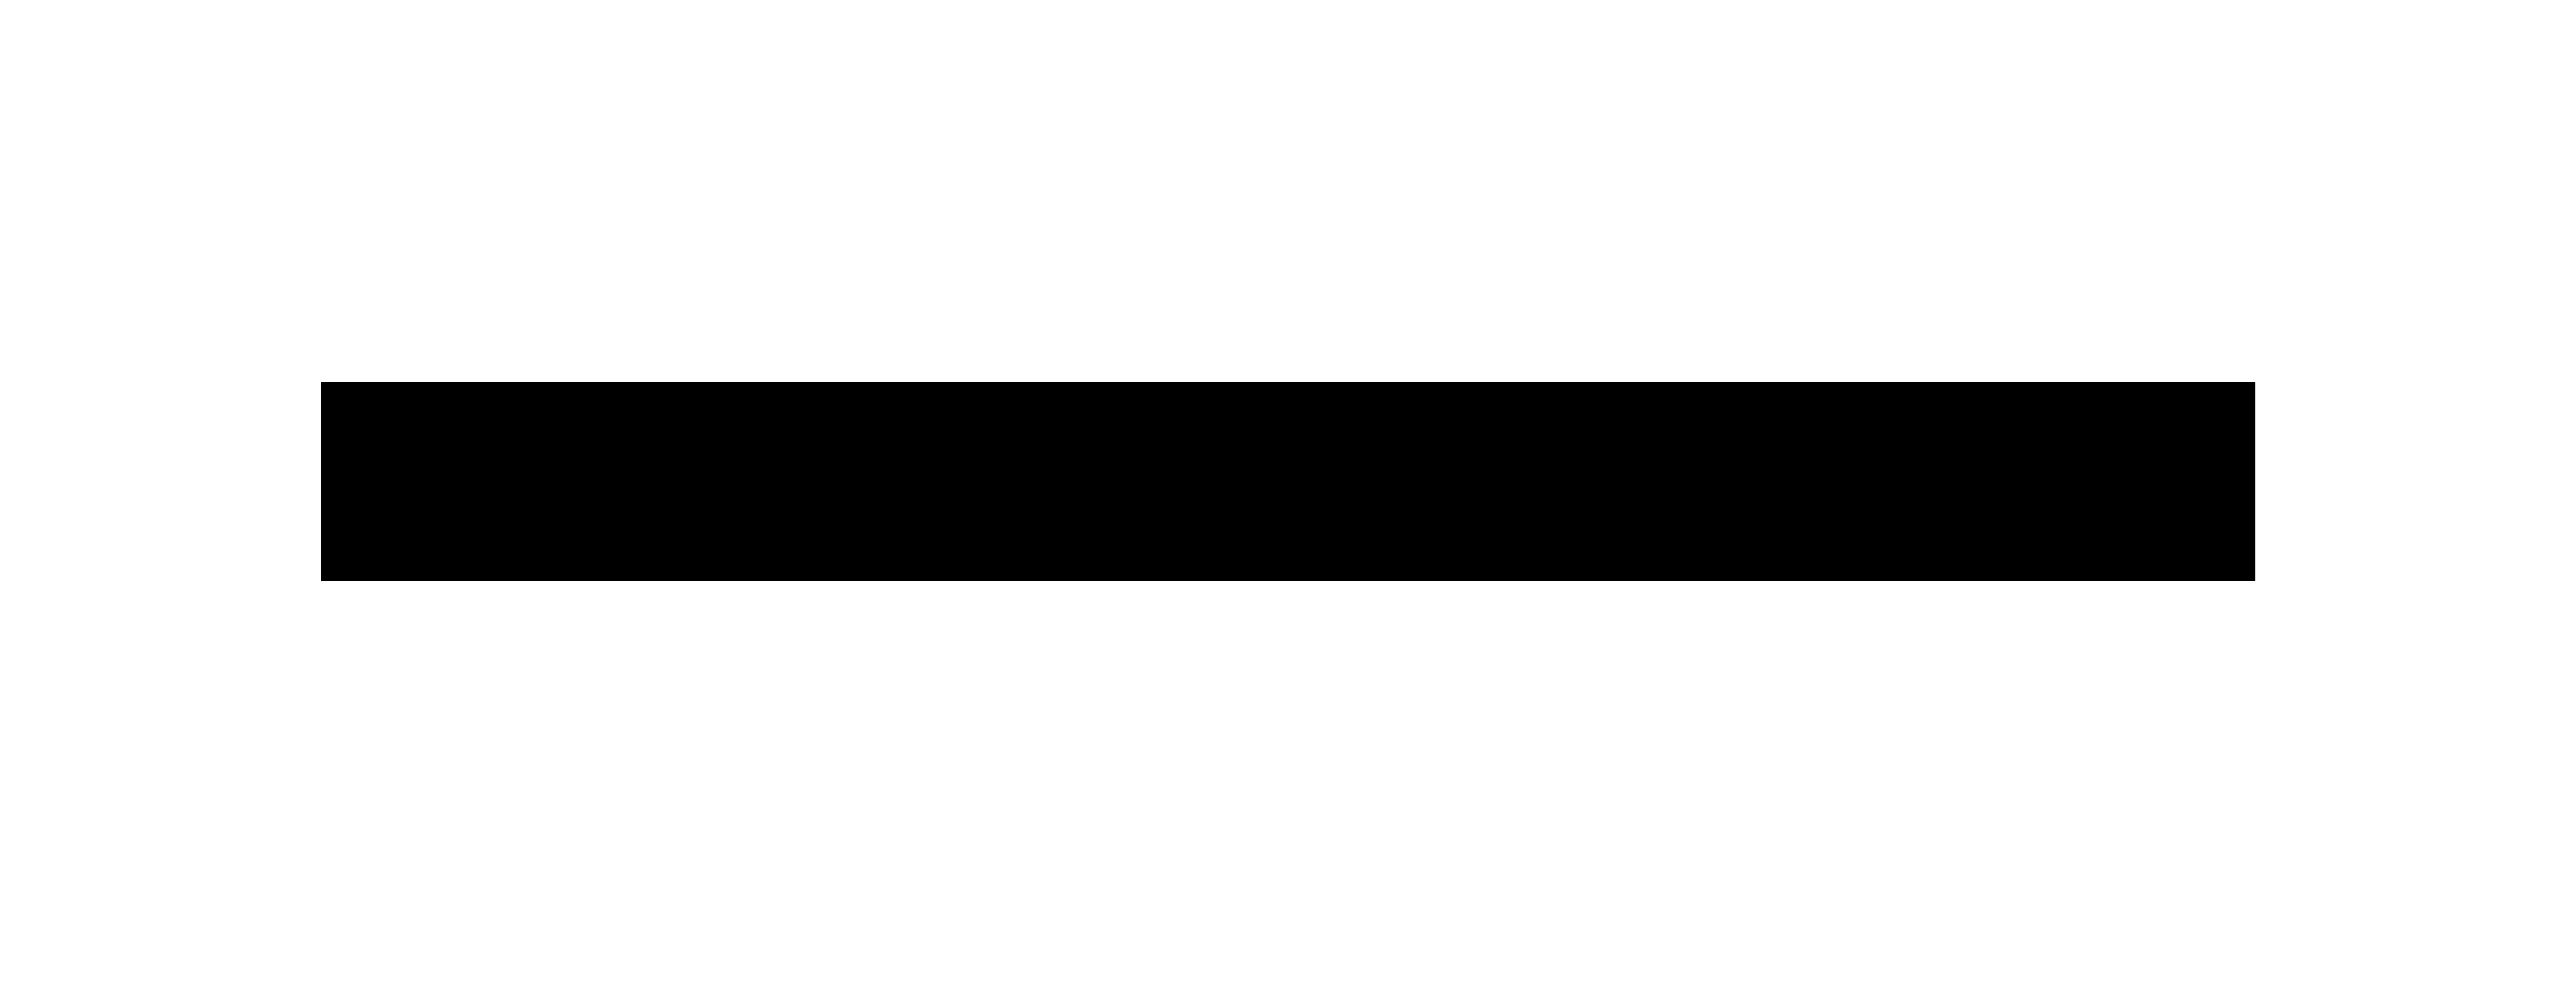 Romain Charrier